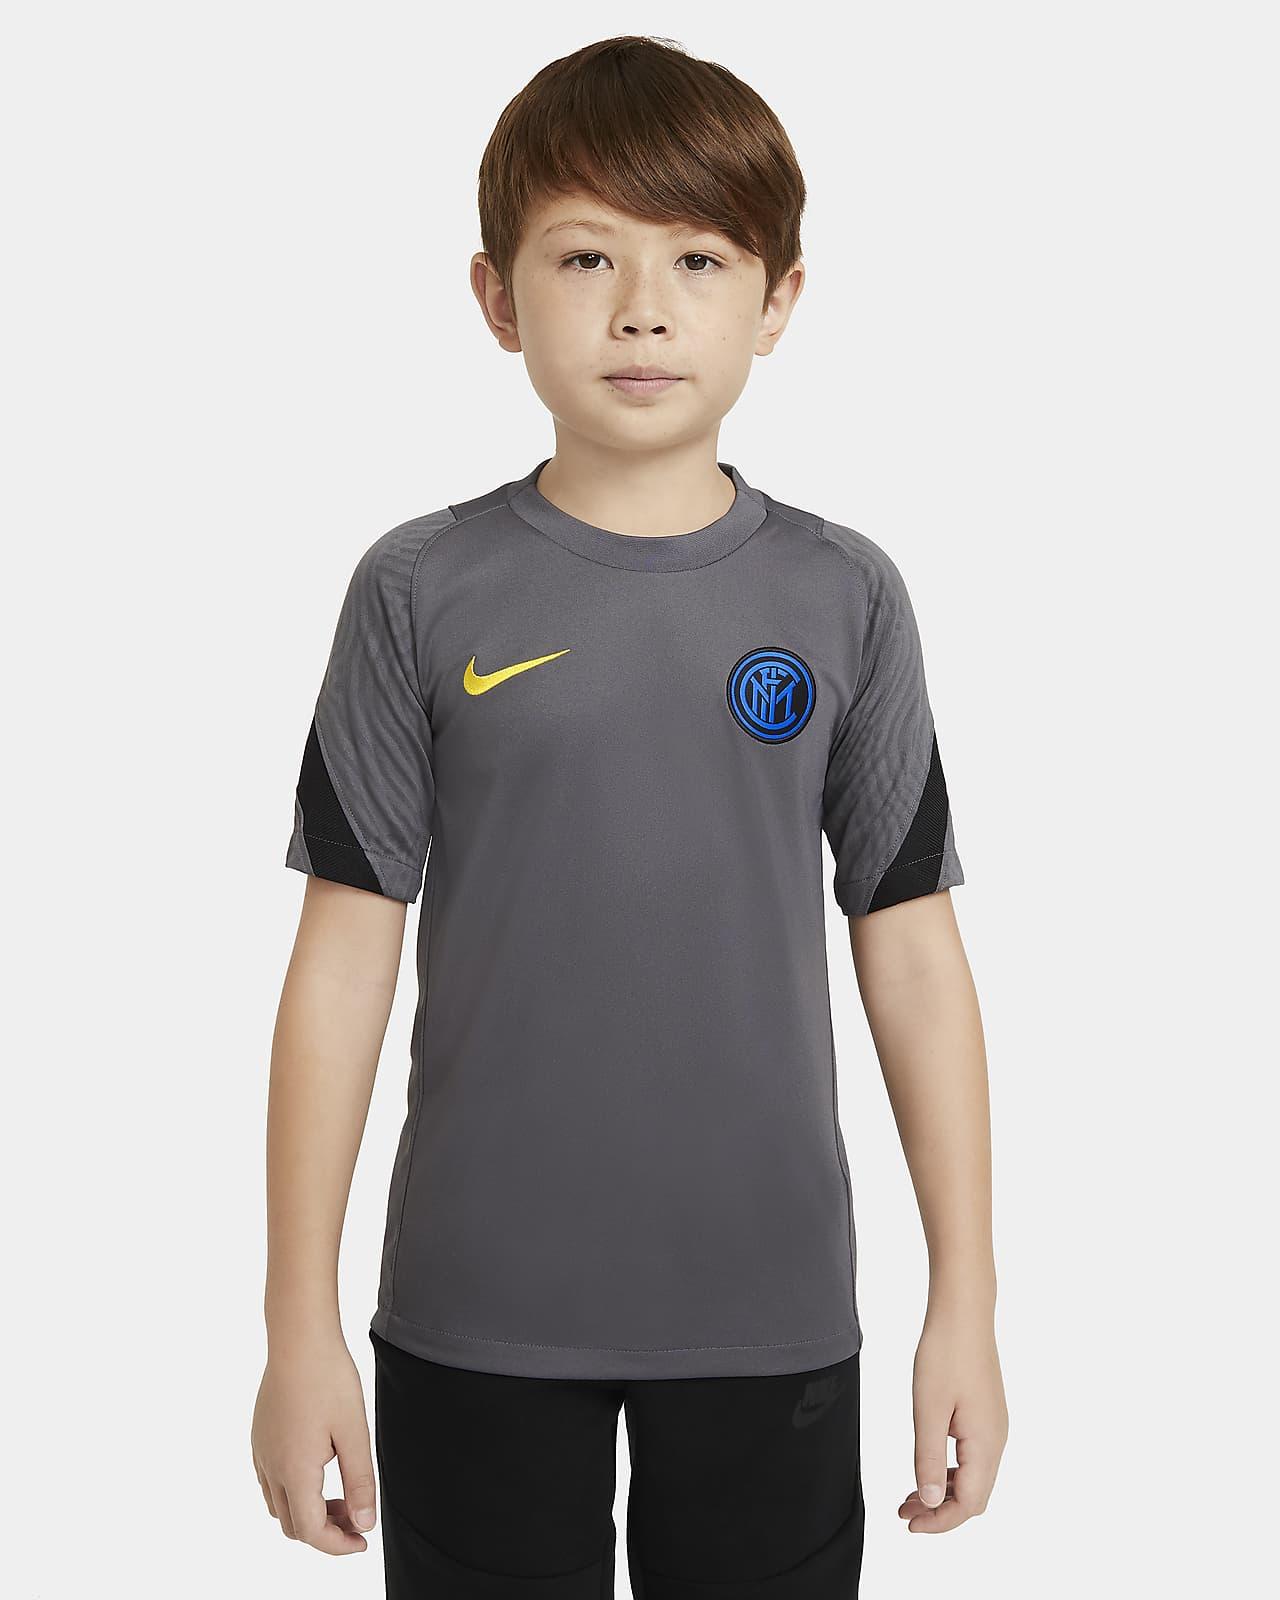 Camiseta de fútbol de manga corta para niños talla grande Inter Milan Strike